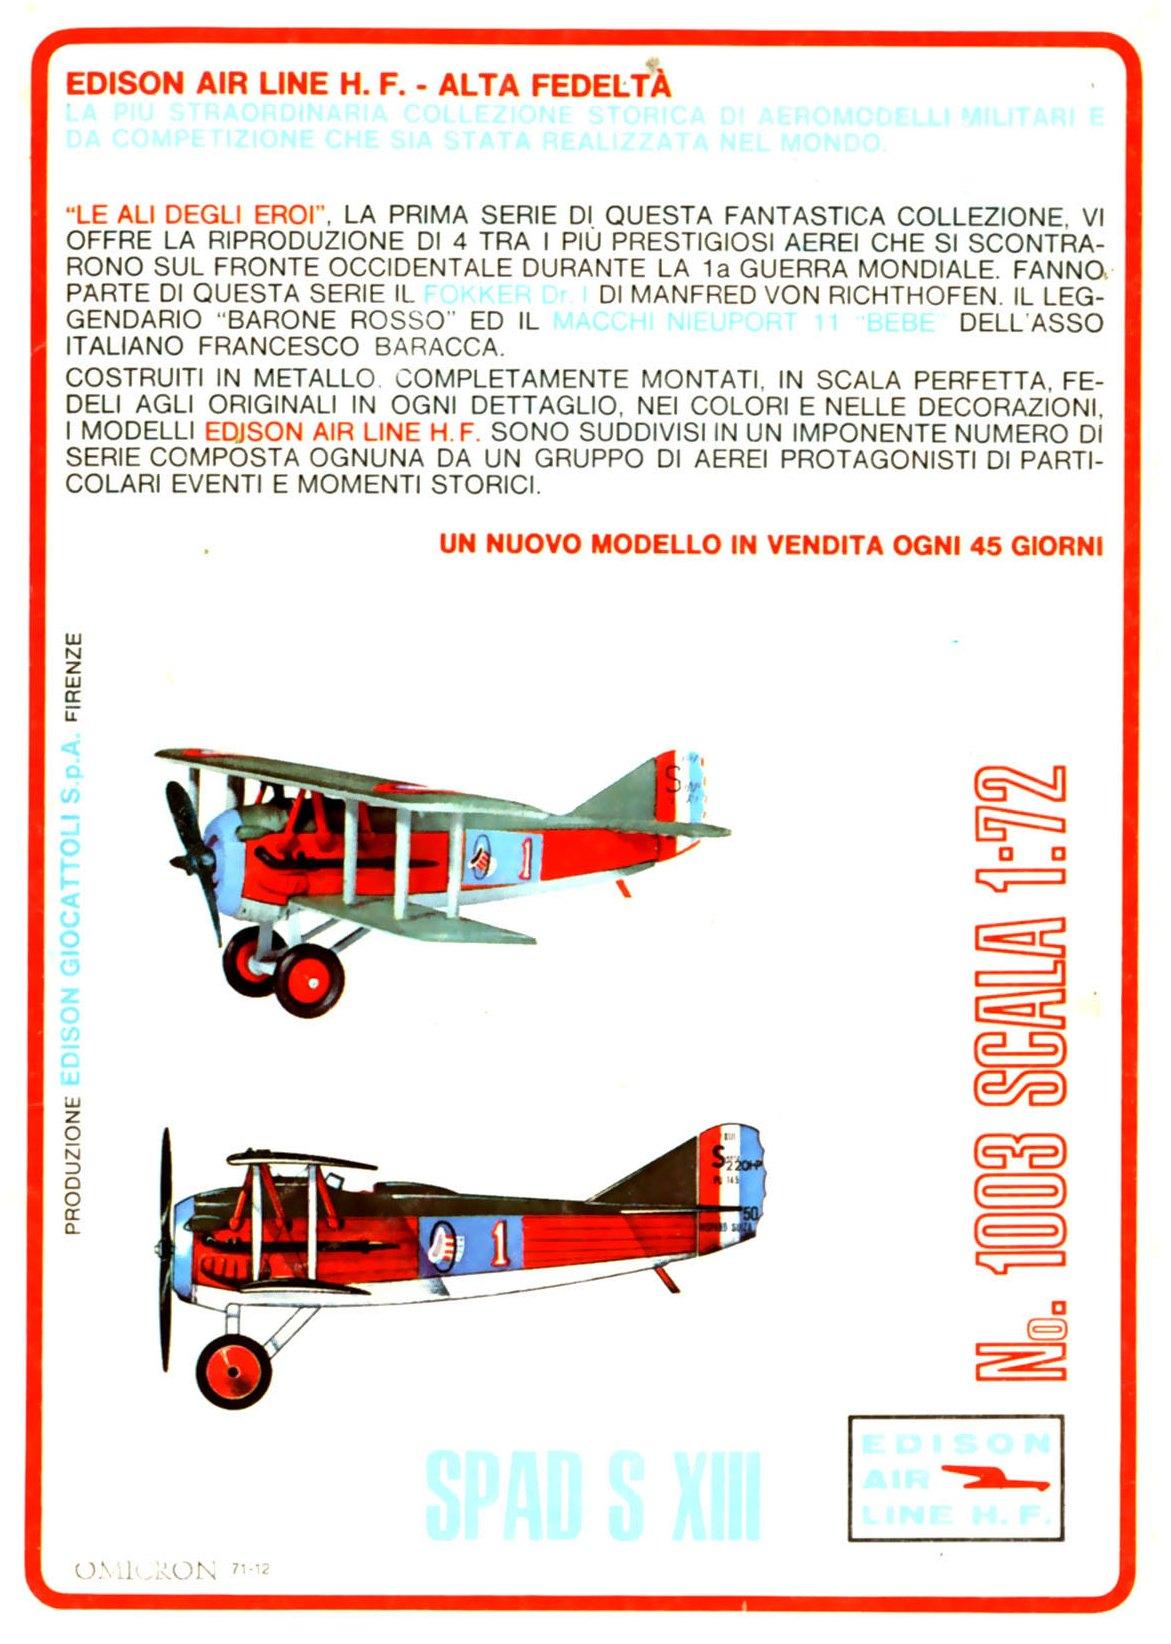 Edison 2 Air Lines H.F